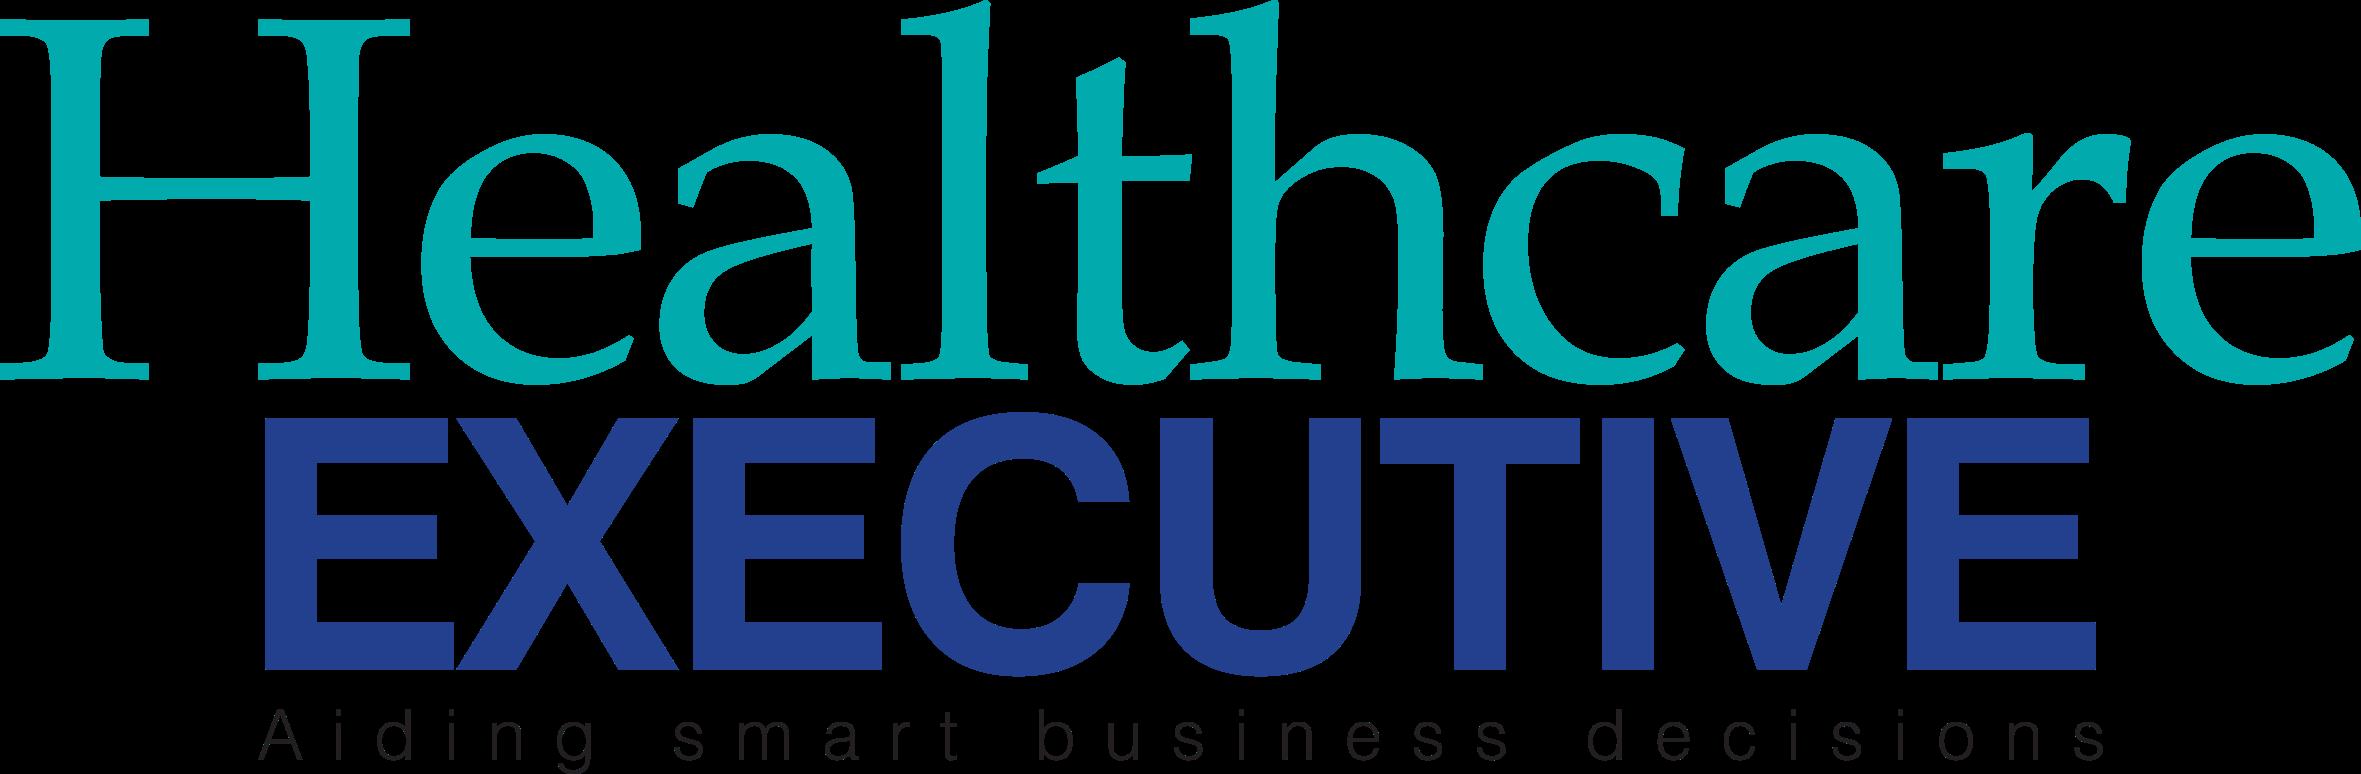 Healthcare Executive logo-Media partner for InnoHEALTH 2018